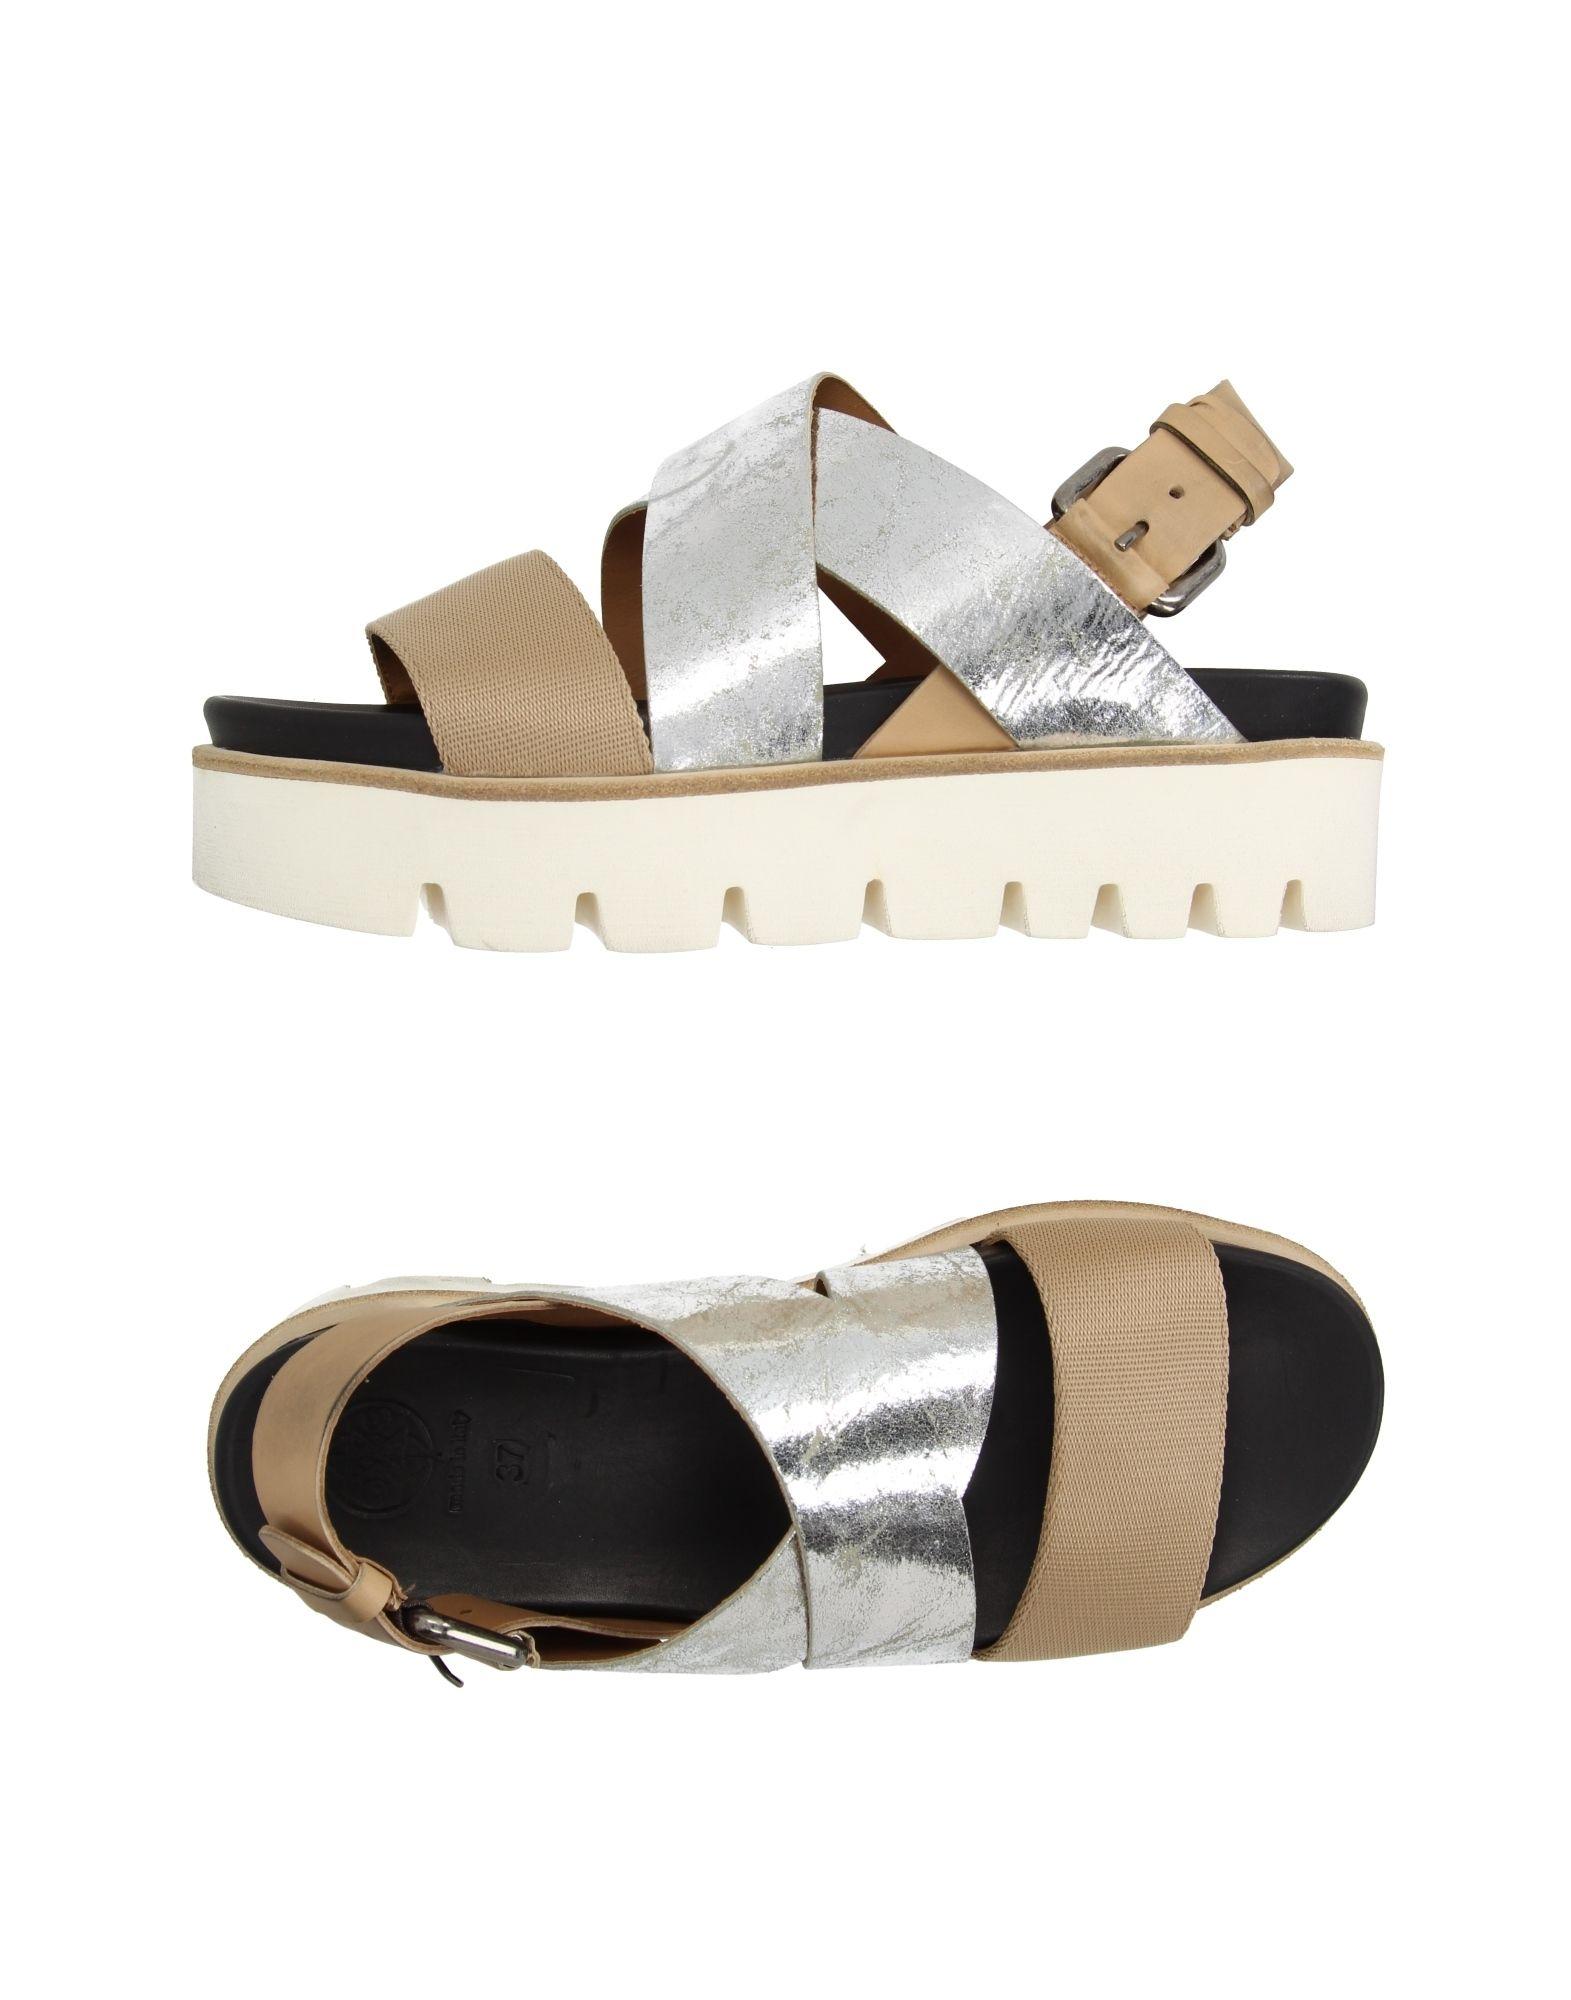 O.X.S. Sandals - Women Women Women O.X.S. Sandals online on  United Kingdom - 11194336GT e08f85